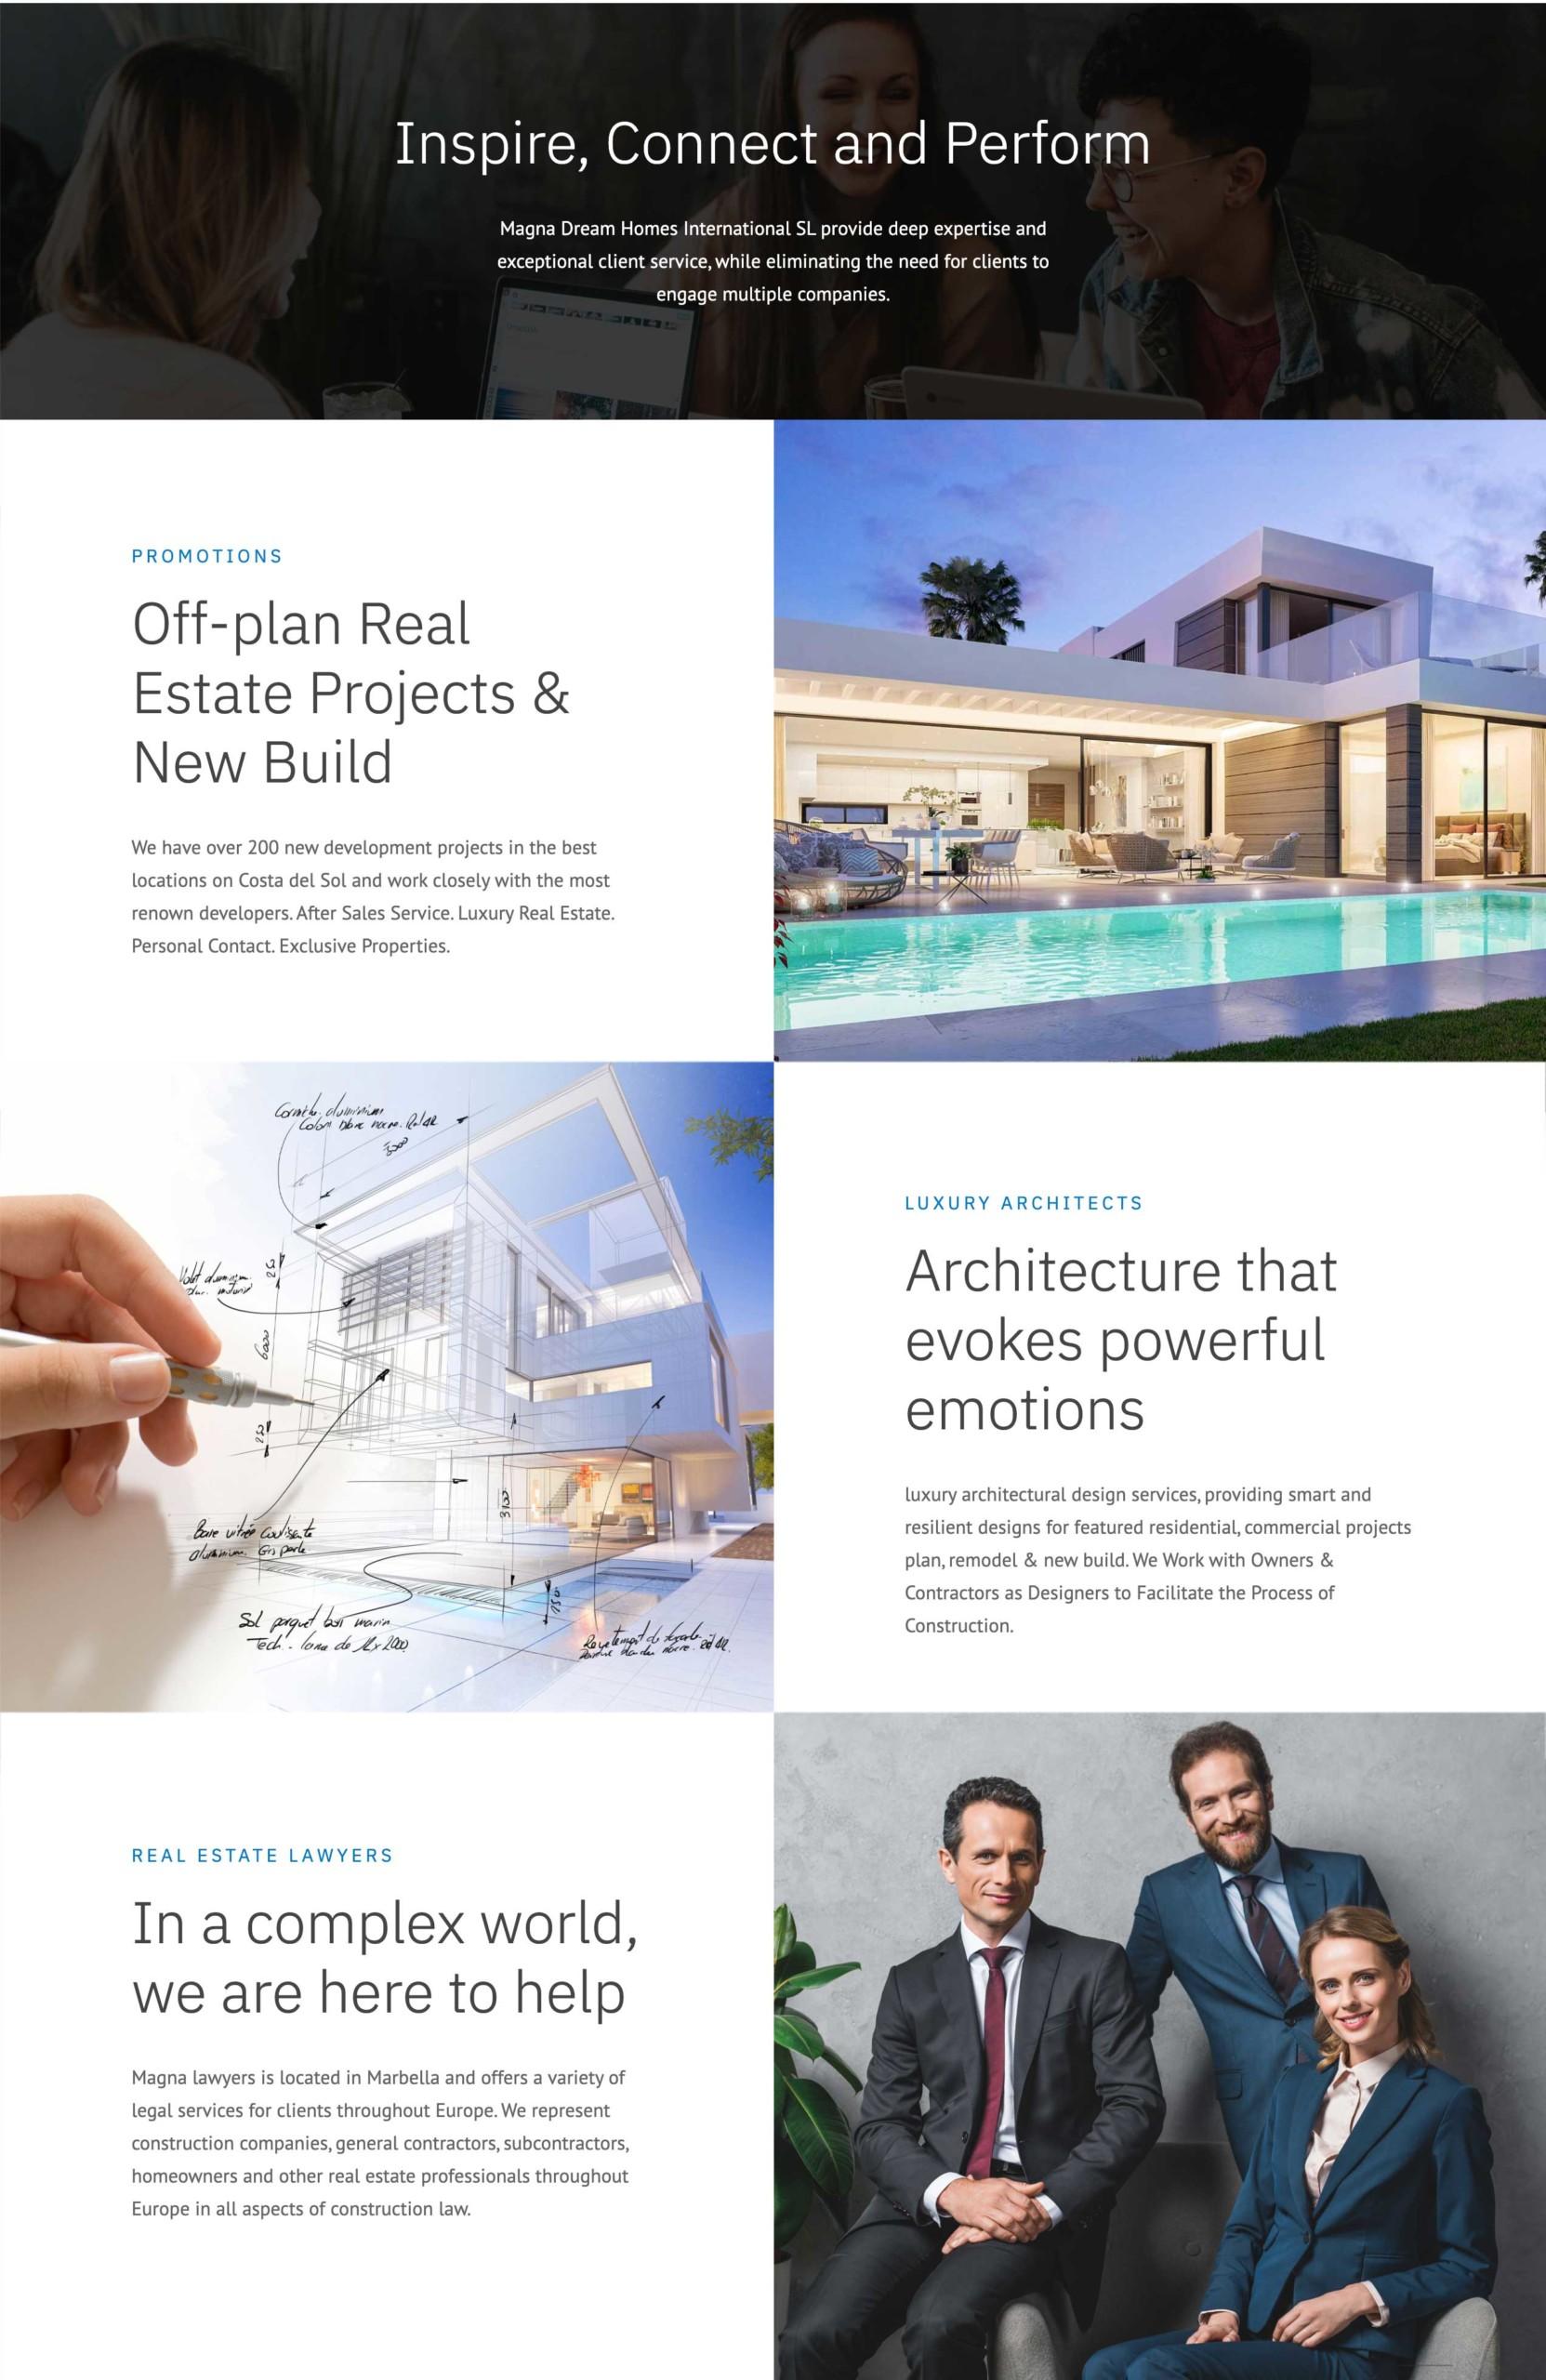 magna dream homes marbella wordpress website design with resales online plugin for wordpress